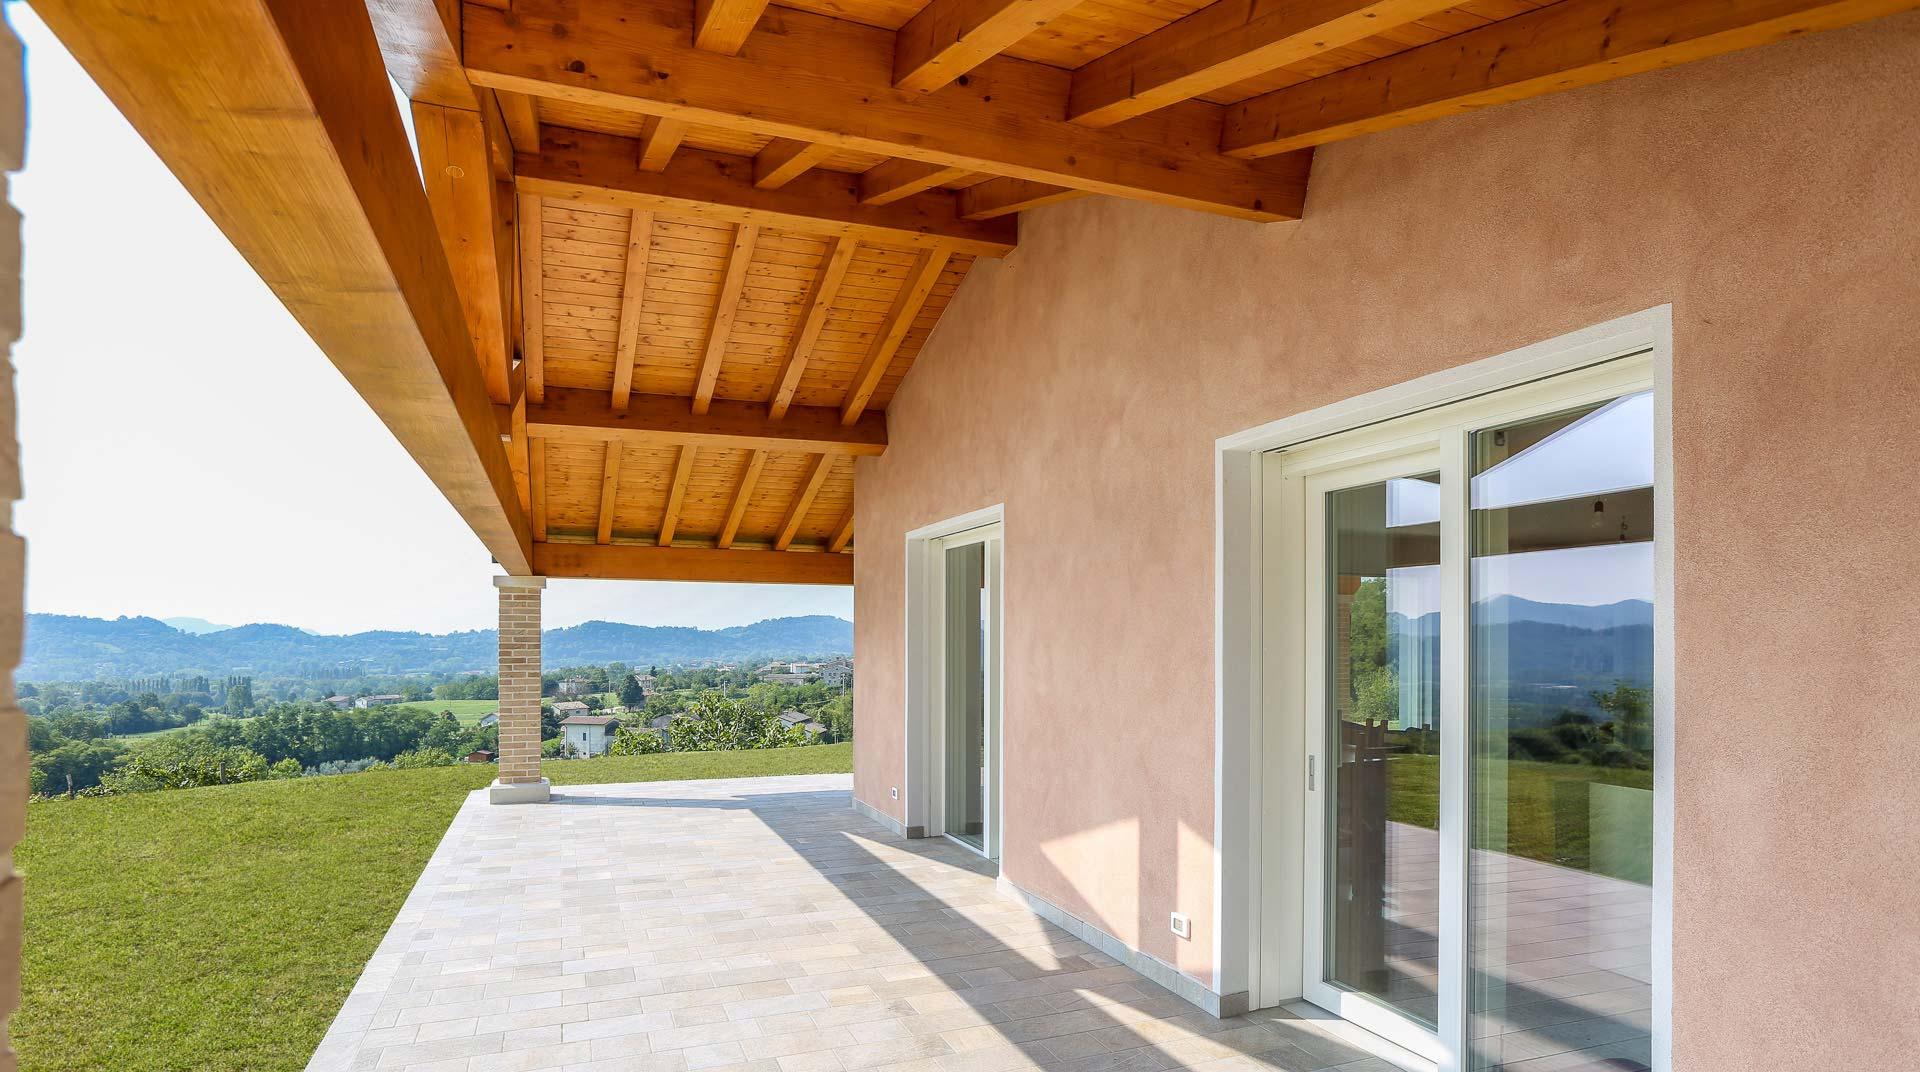 Interni Case Prefabbricate In Legno case in legno vicenza, case passive, case in bioedilizia